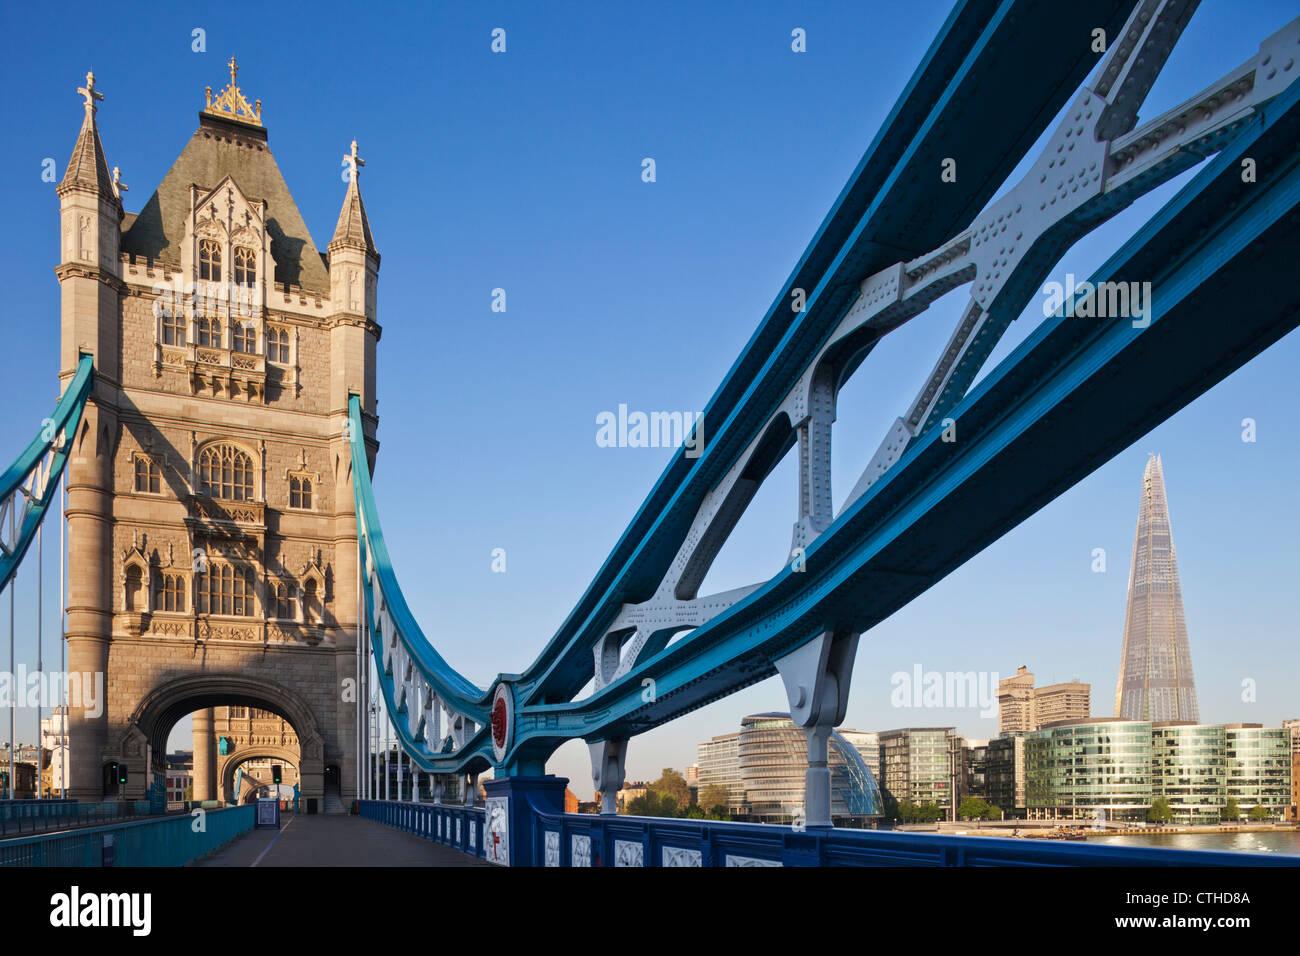 Inglaterra, Londres, Southwark, el Tower Bridge y el Shard Imagen De Stock